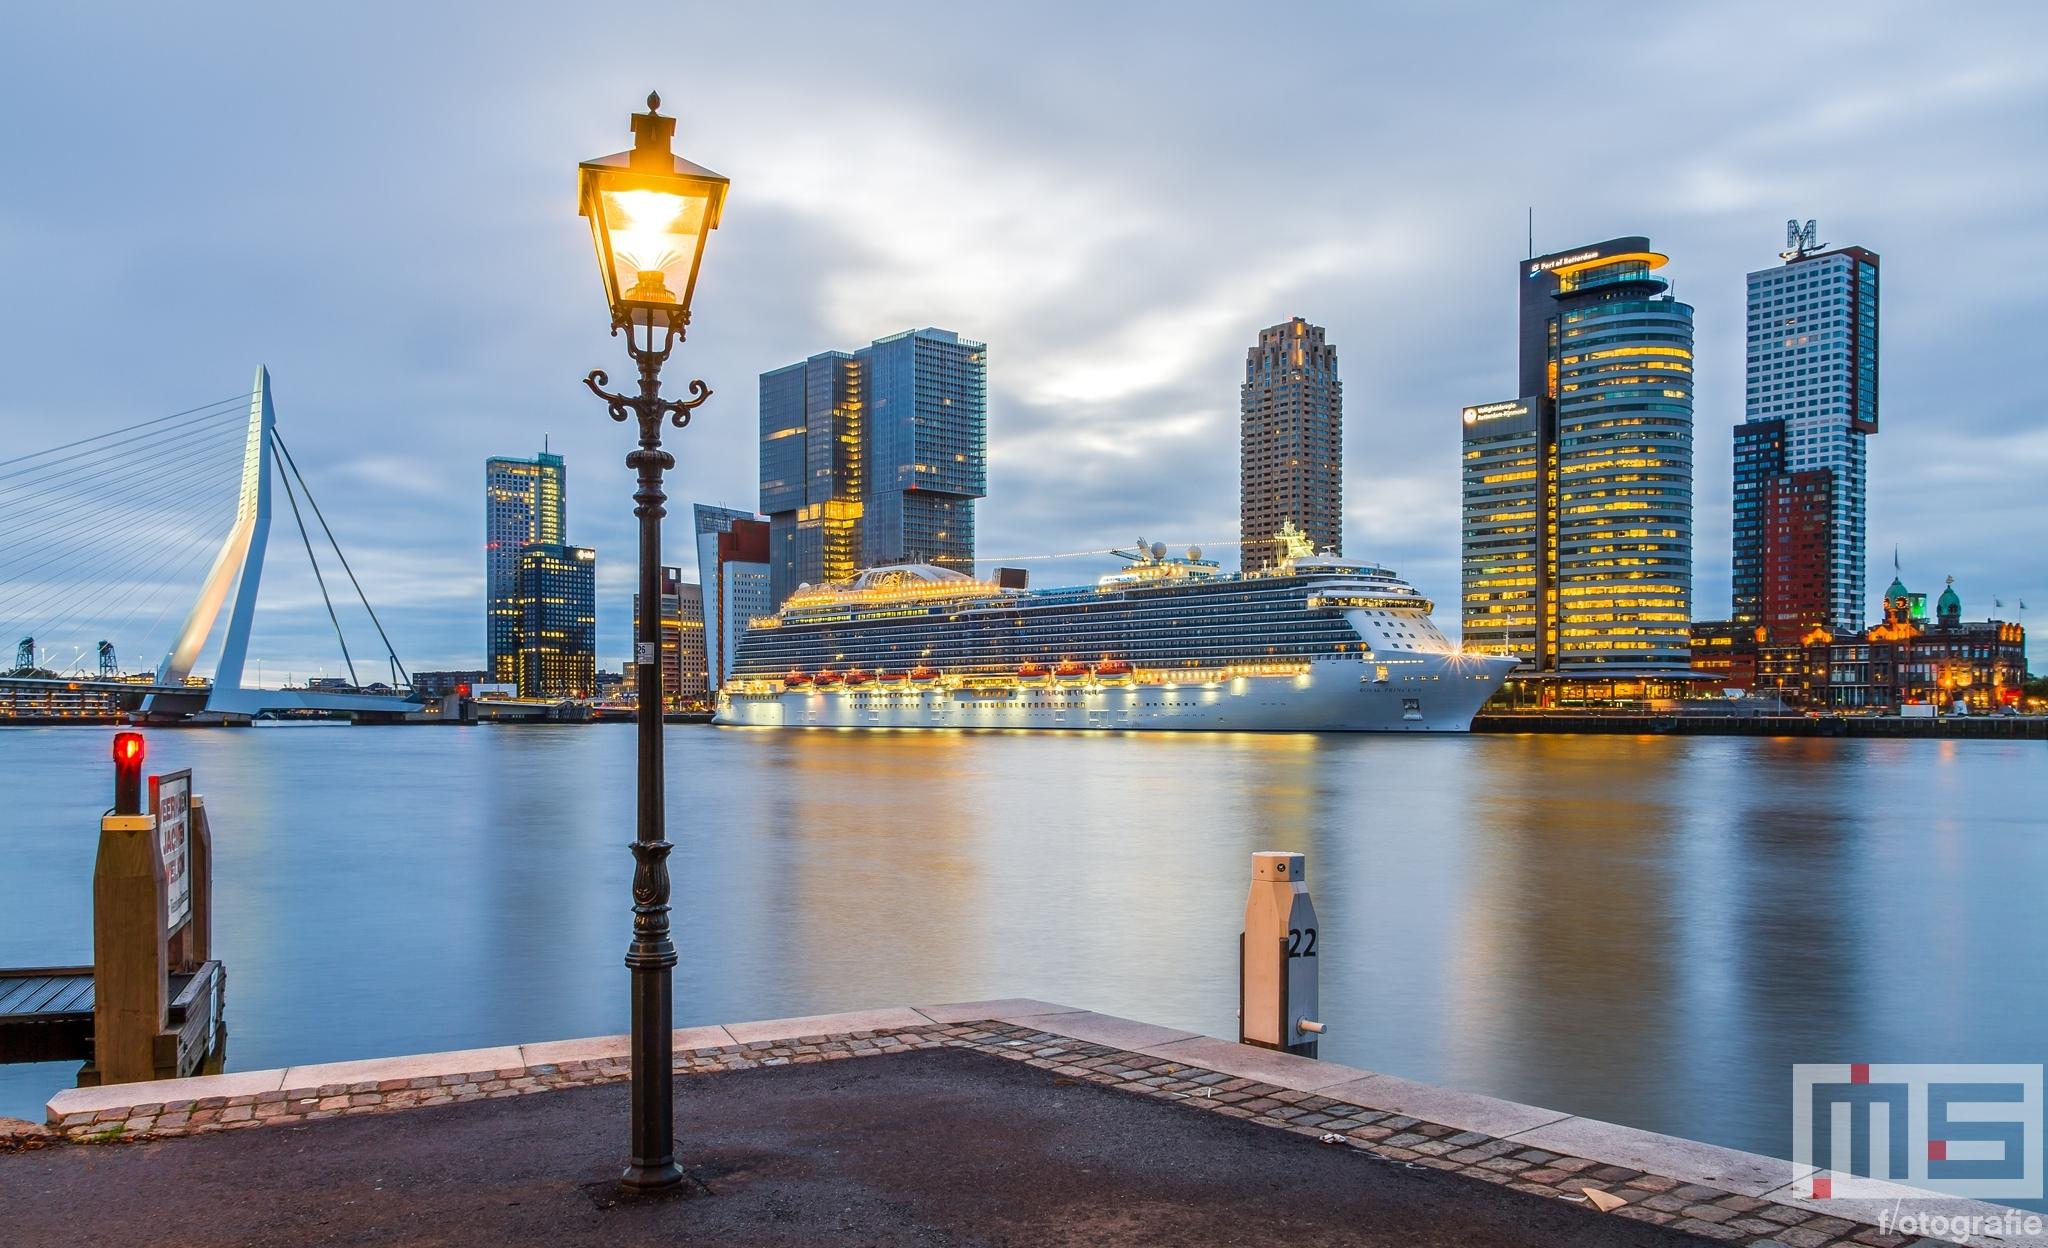 Te Koop   Het cruiseschip Royal Princess aan de Cruise Terminal in Rotterdam